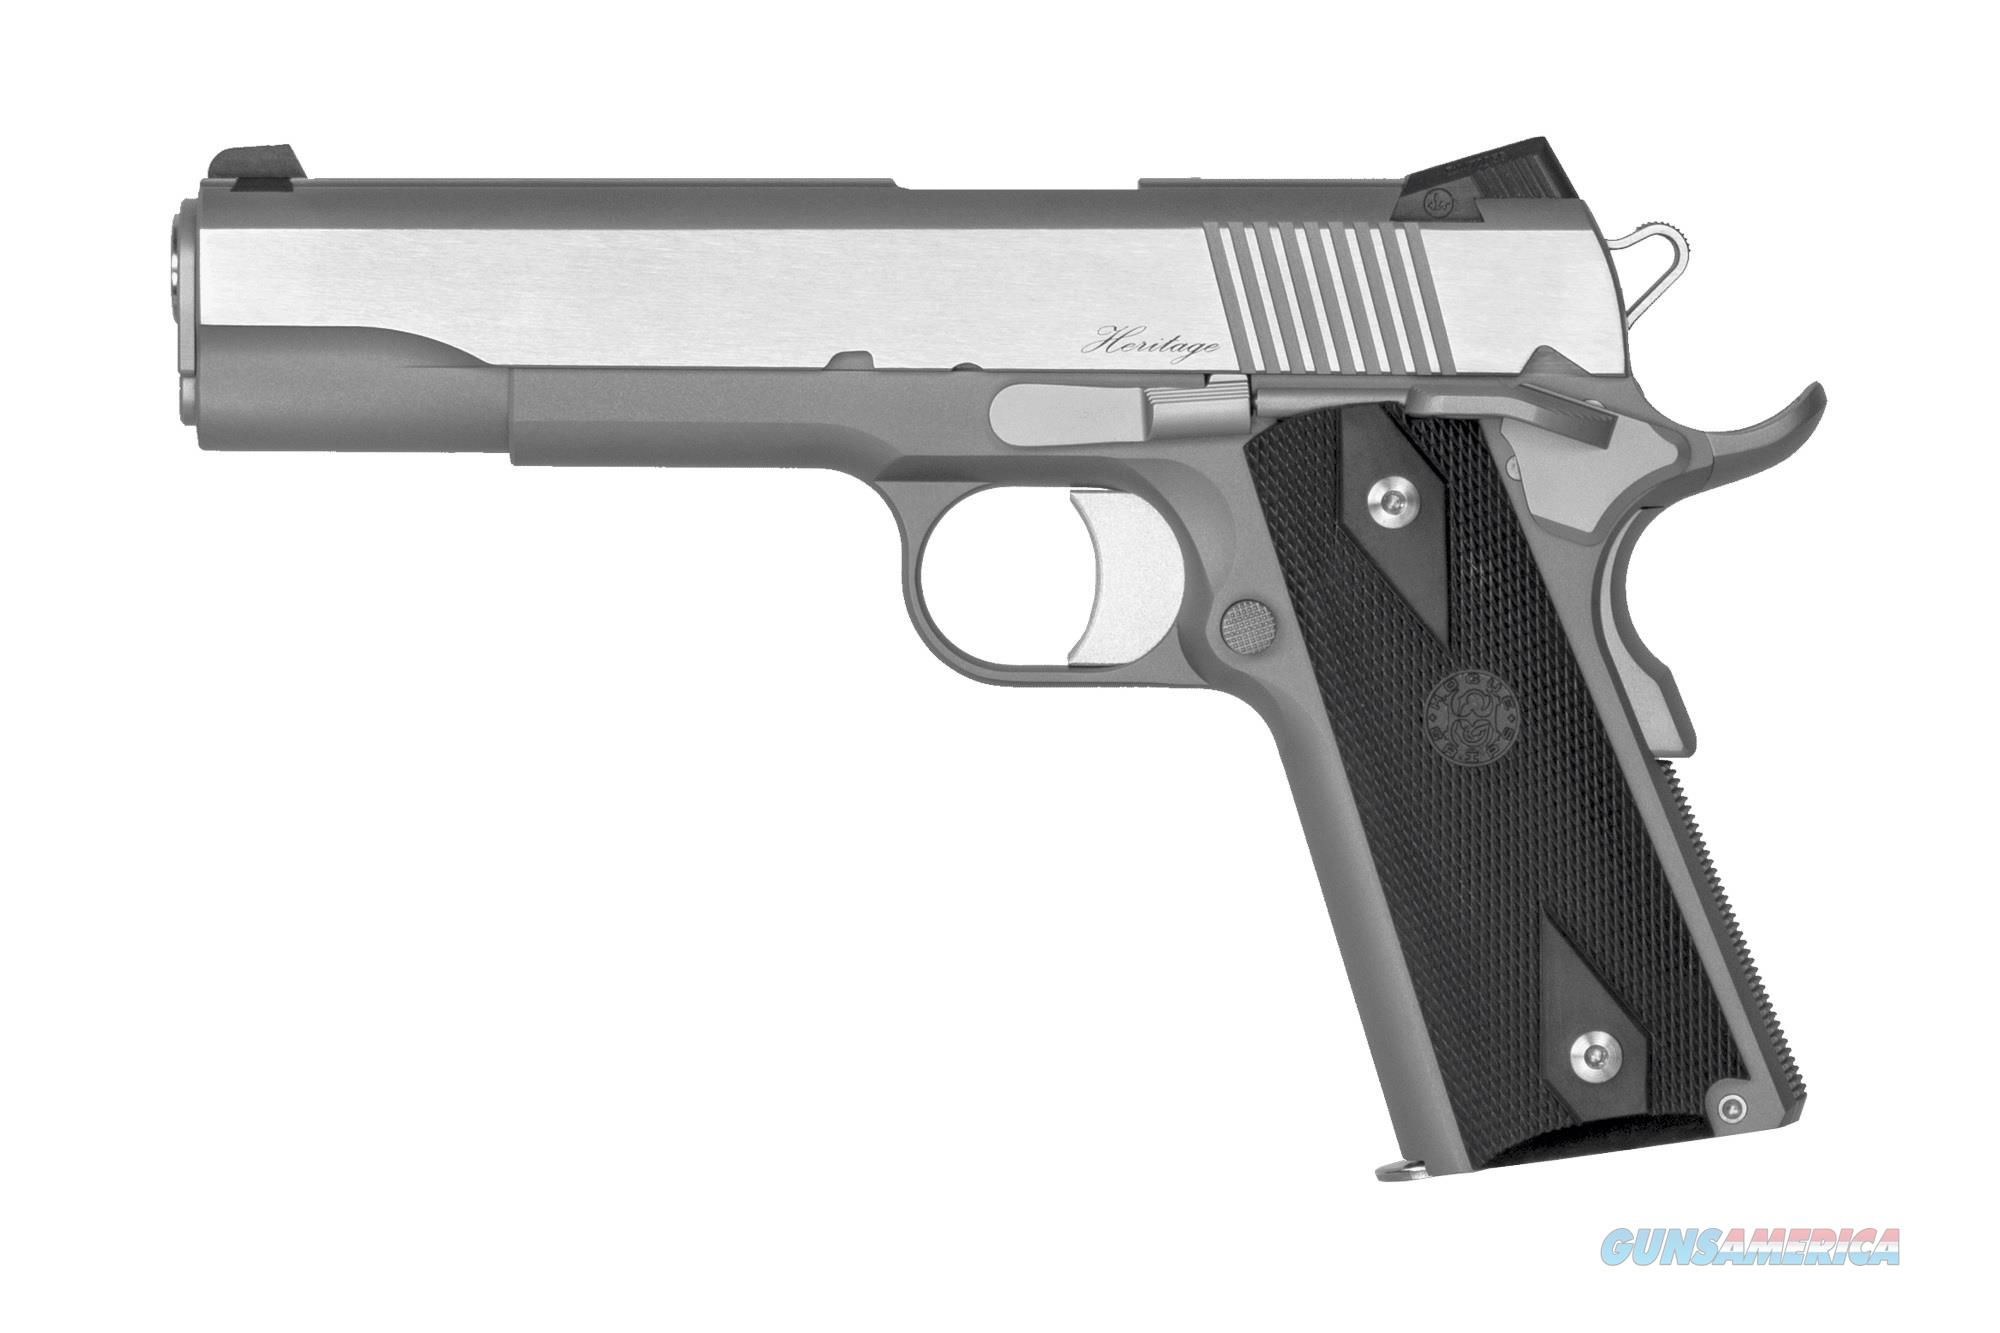 "CZ-USA Dan Wesson Heritage RZ-45 .45 ACP 5"" 8rds 01981   Guns > Pistols > Dan Wesson Pistols/Revolvers > 1911 Style"